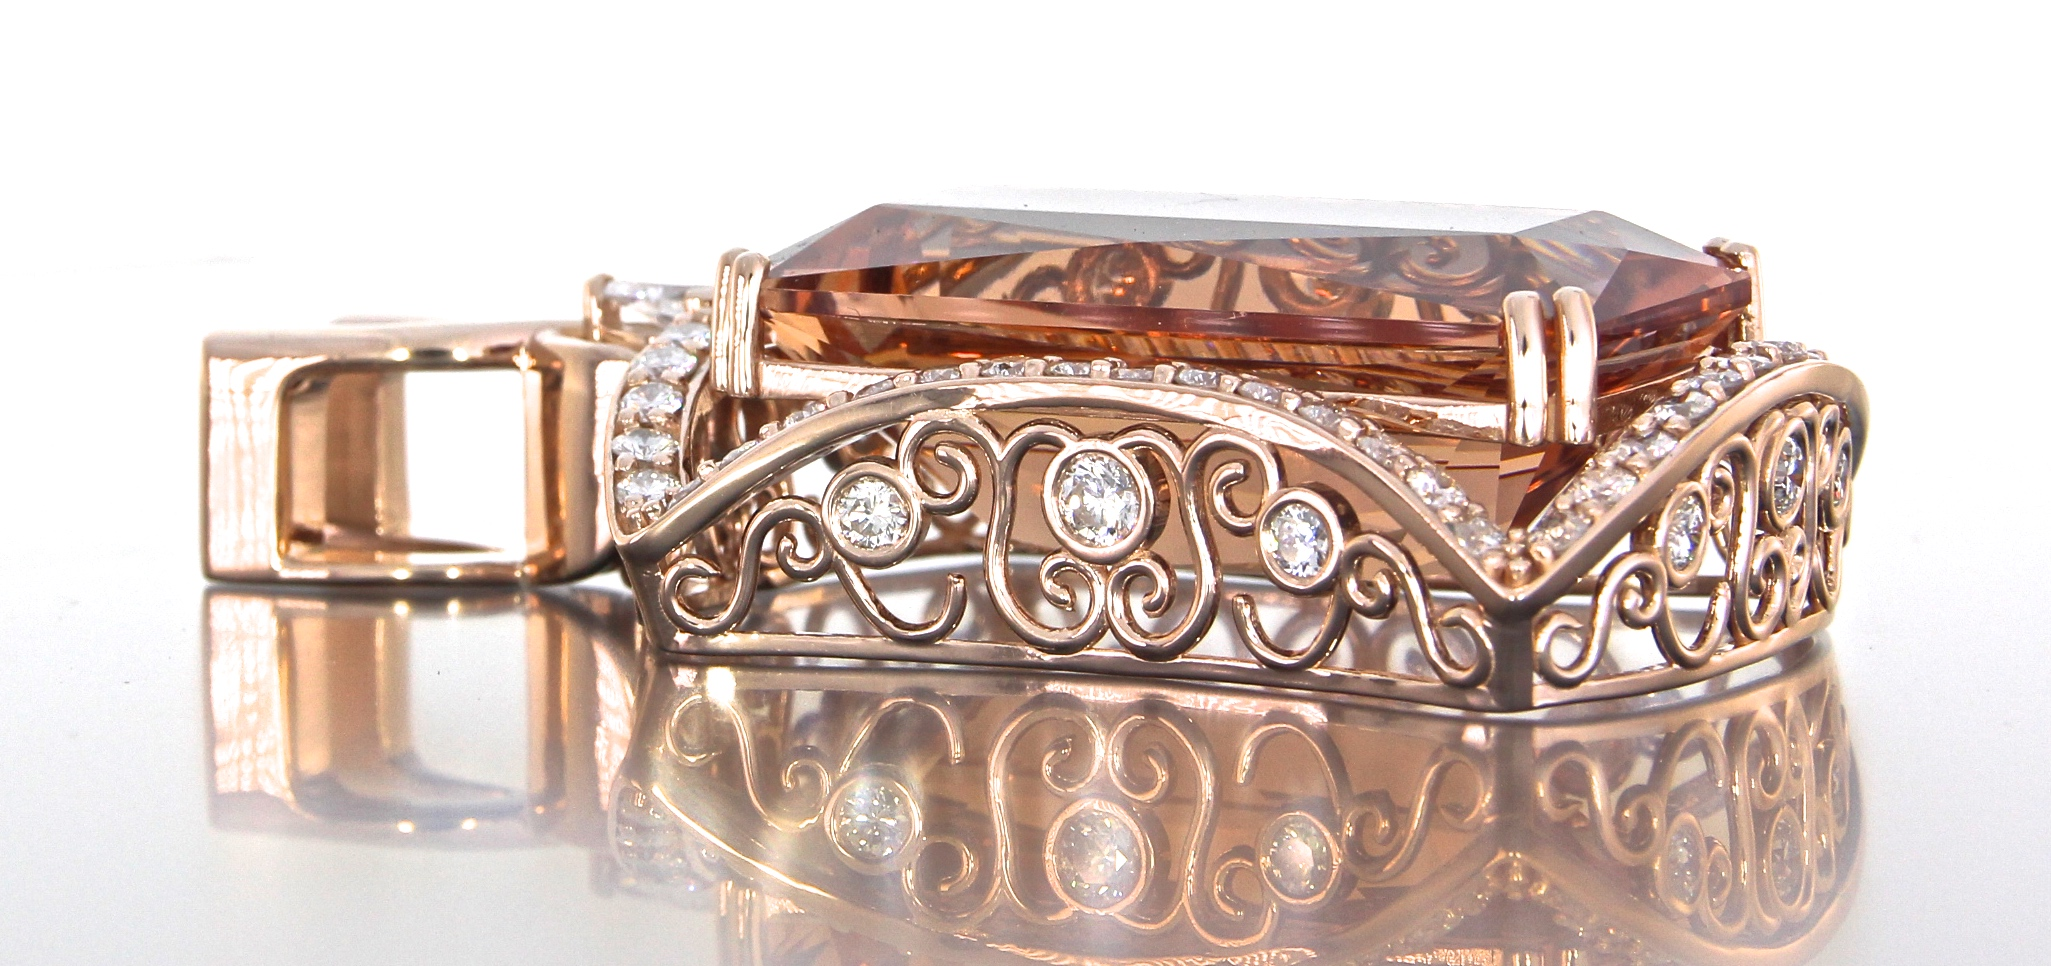 unique-custom-morganite-pendant-rose-gold-diamonds-halo-pendant-side-view-craft-revival-jewelry-store-grand-rapids